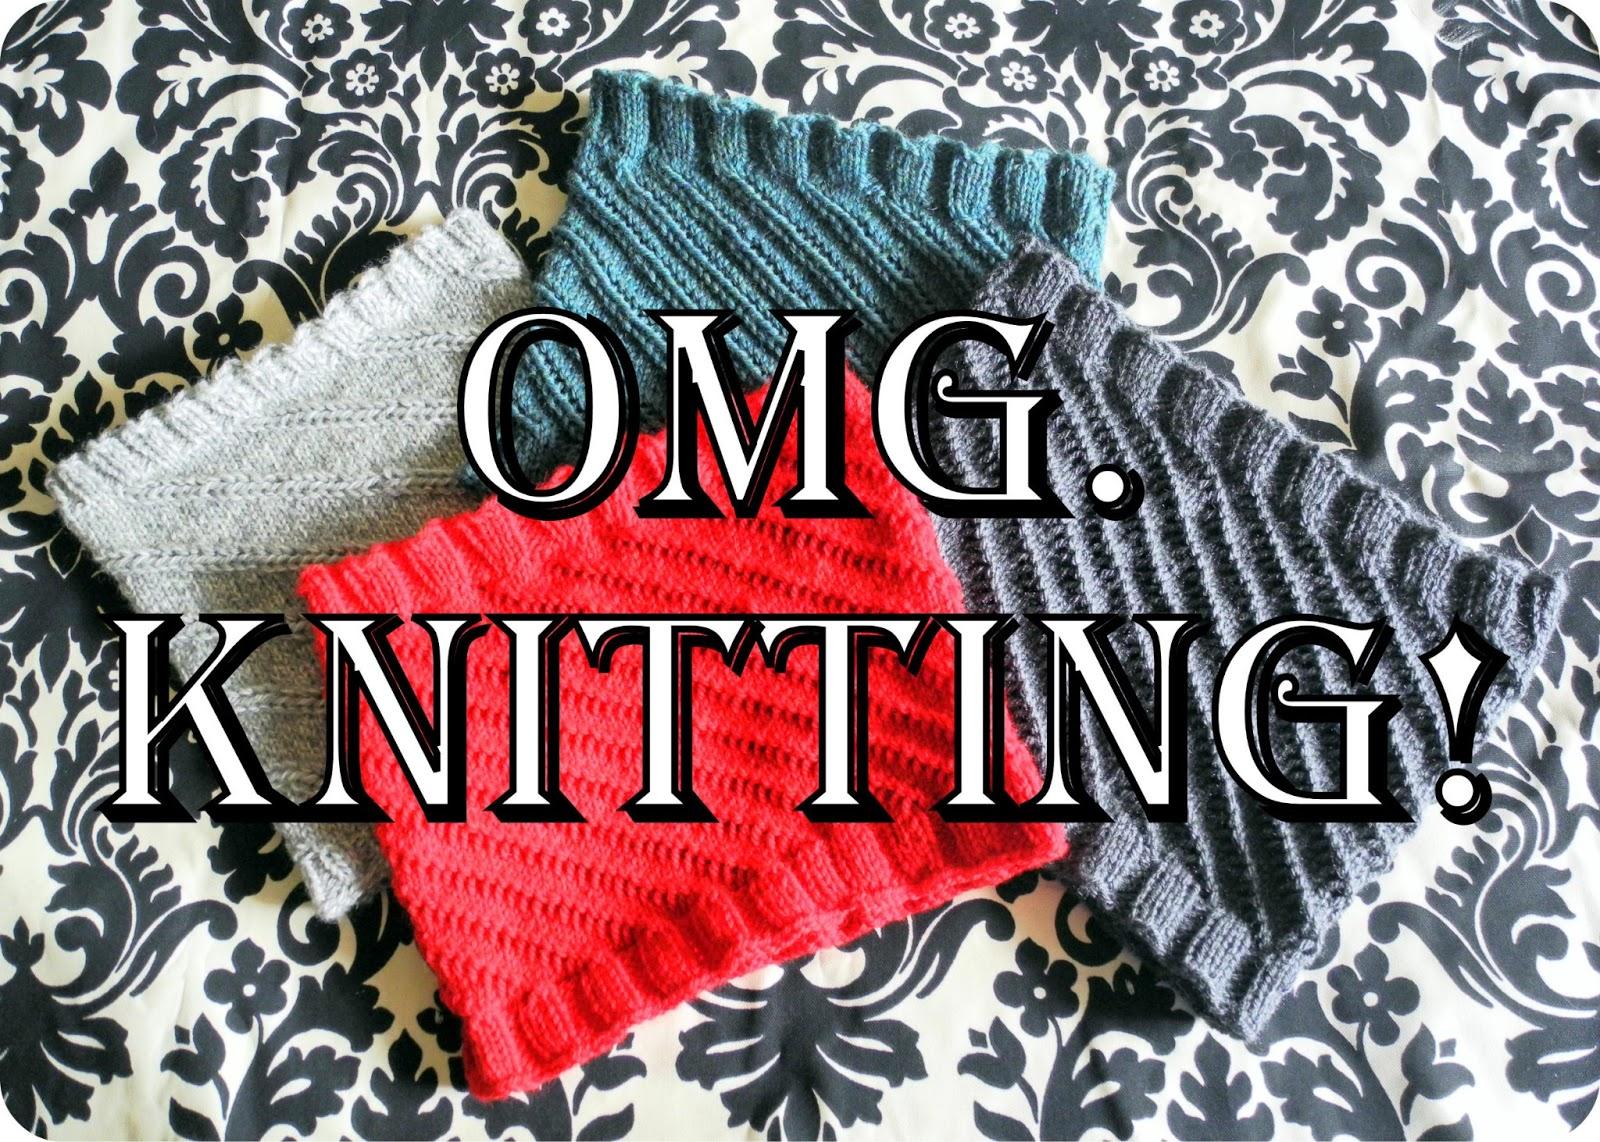 deb03169d895 Knitting not allowed (because I m jealous) — Matthew Dicks